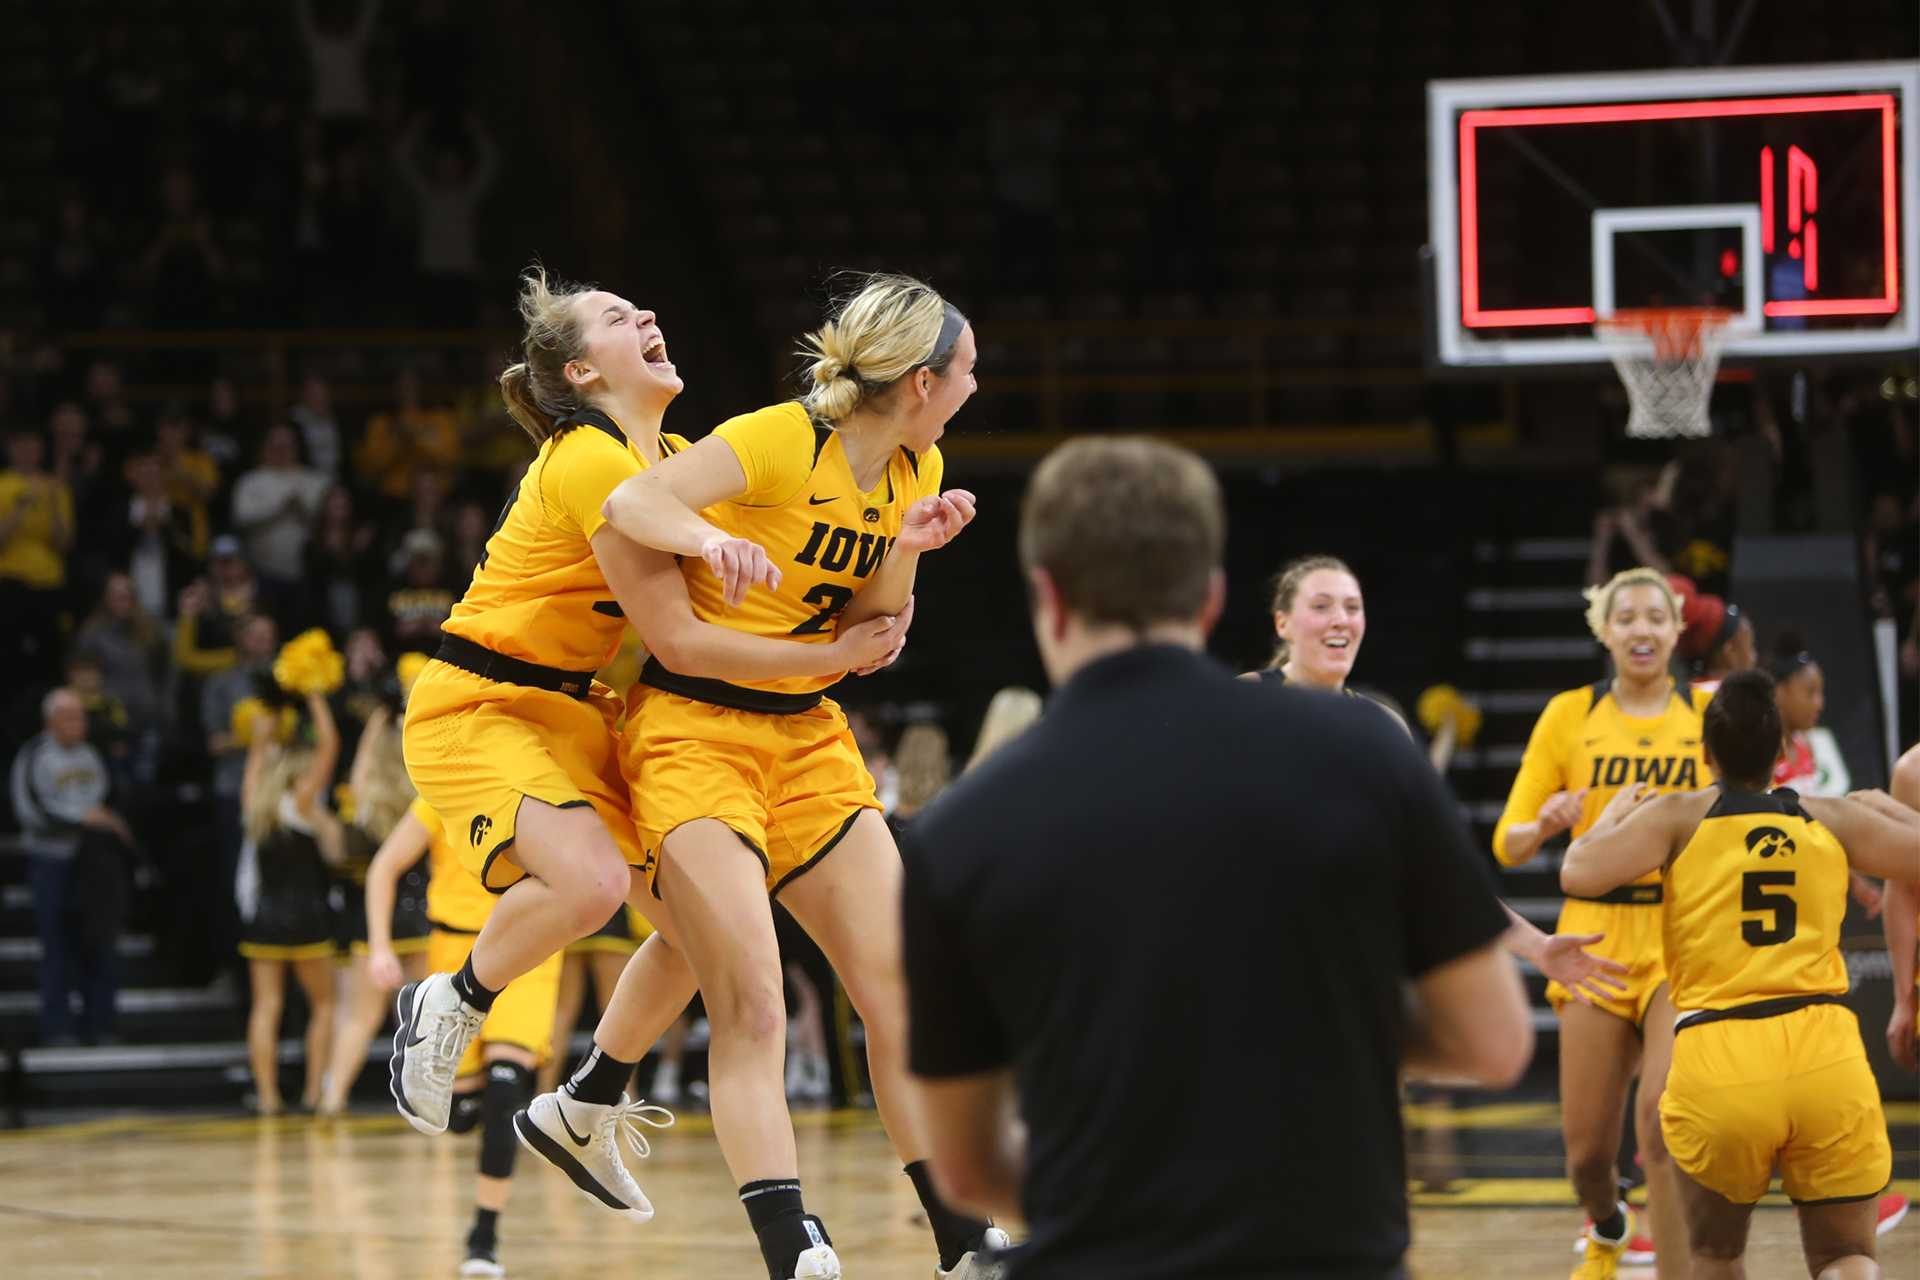 Hawkeyes Back to their Winning Ways, Upset Ohio State